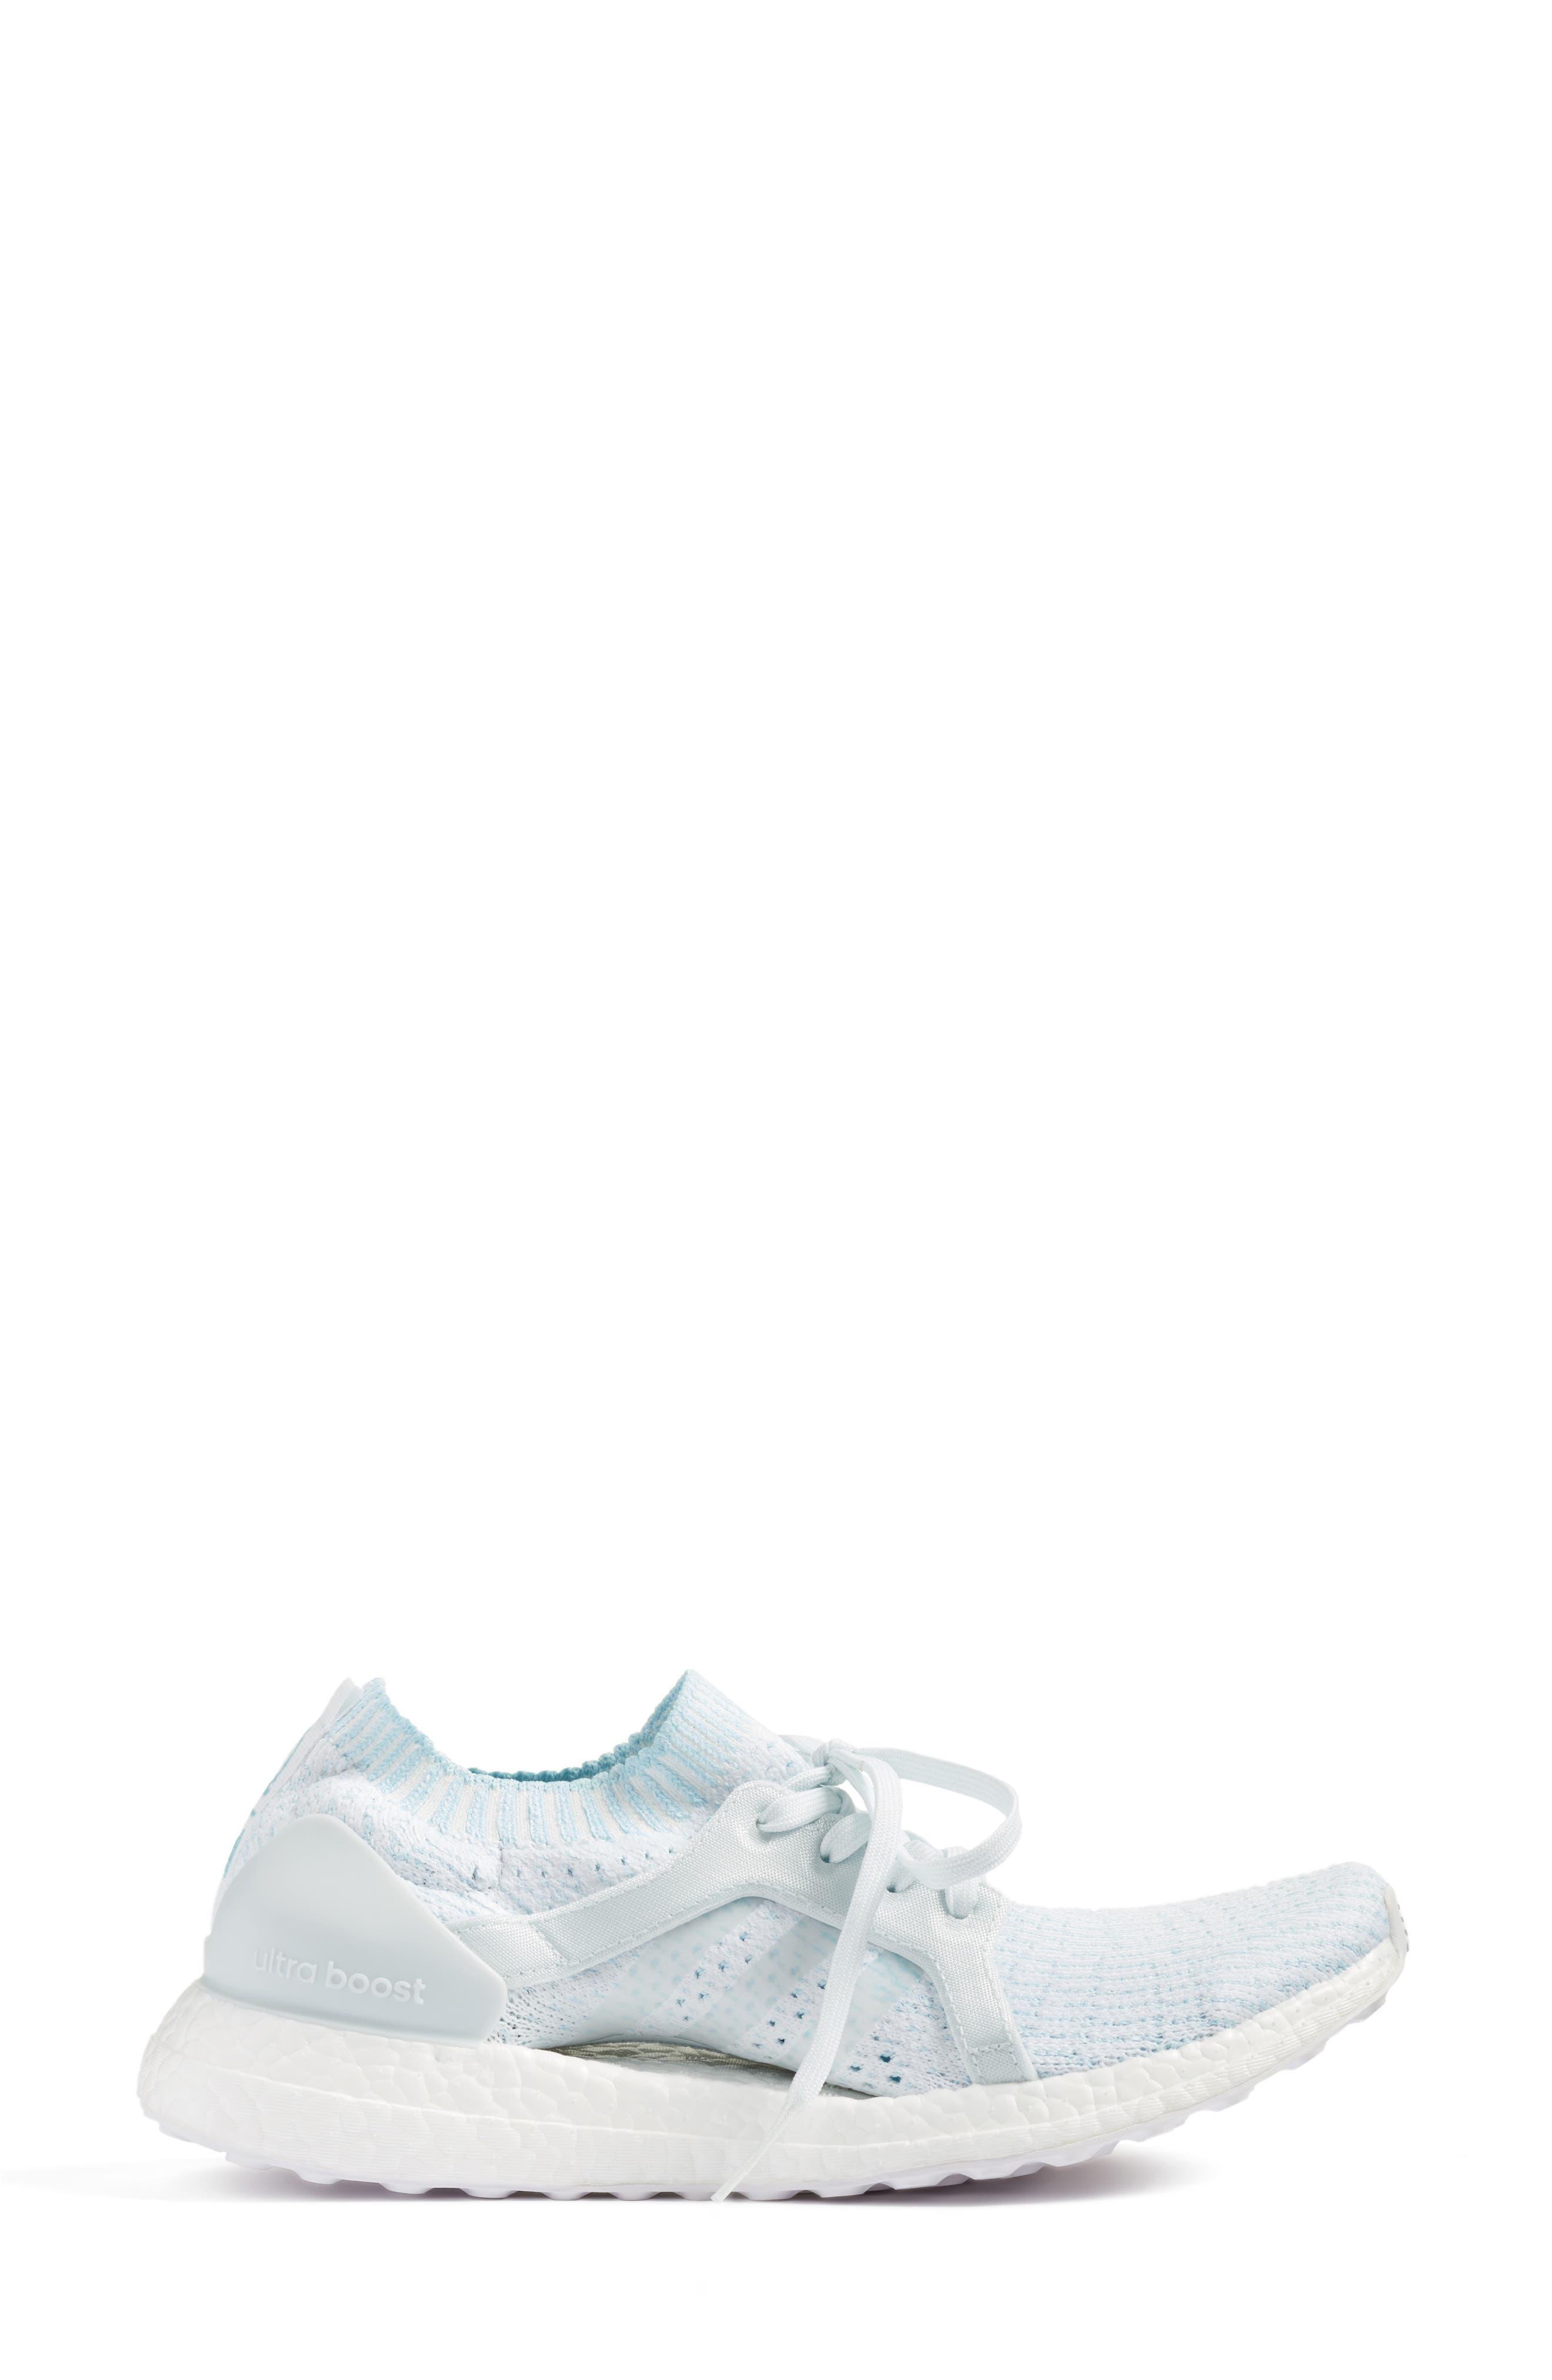 Alternate Image 3  - adidas Ultraboost x Parley Running Shoe (Women)